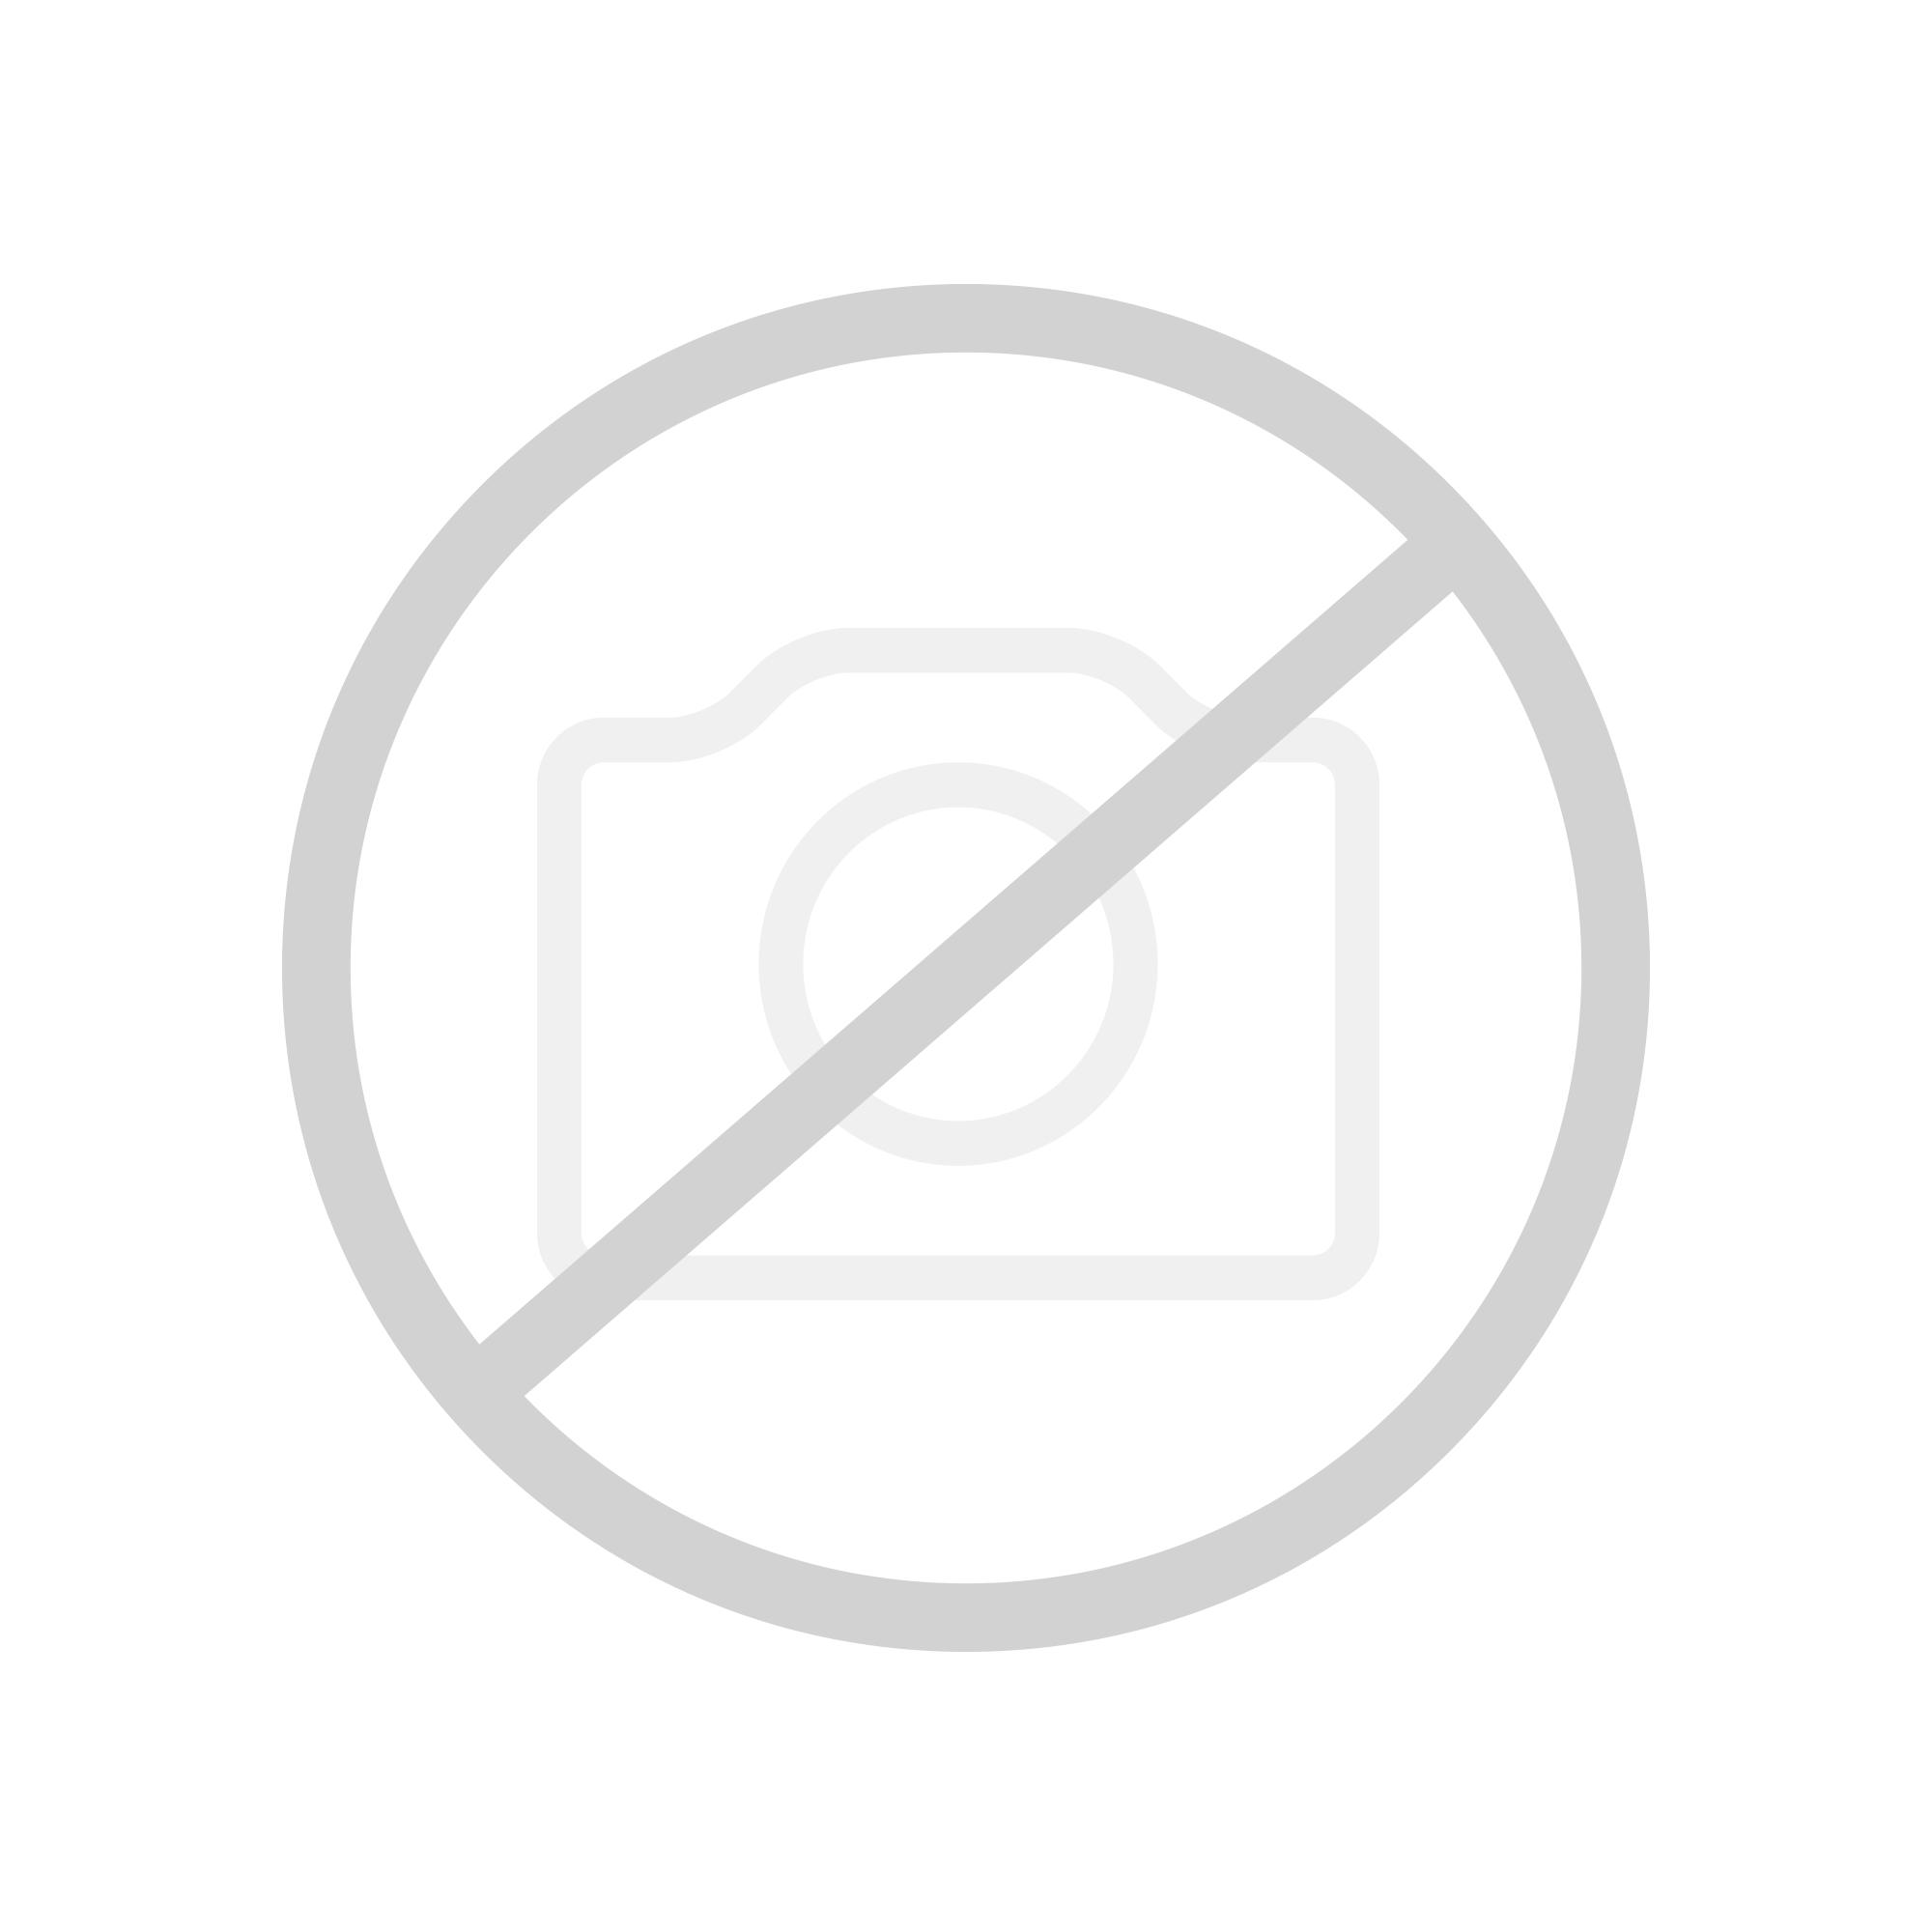 Emco Select LED-Lichtspiegelschrank